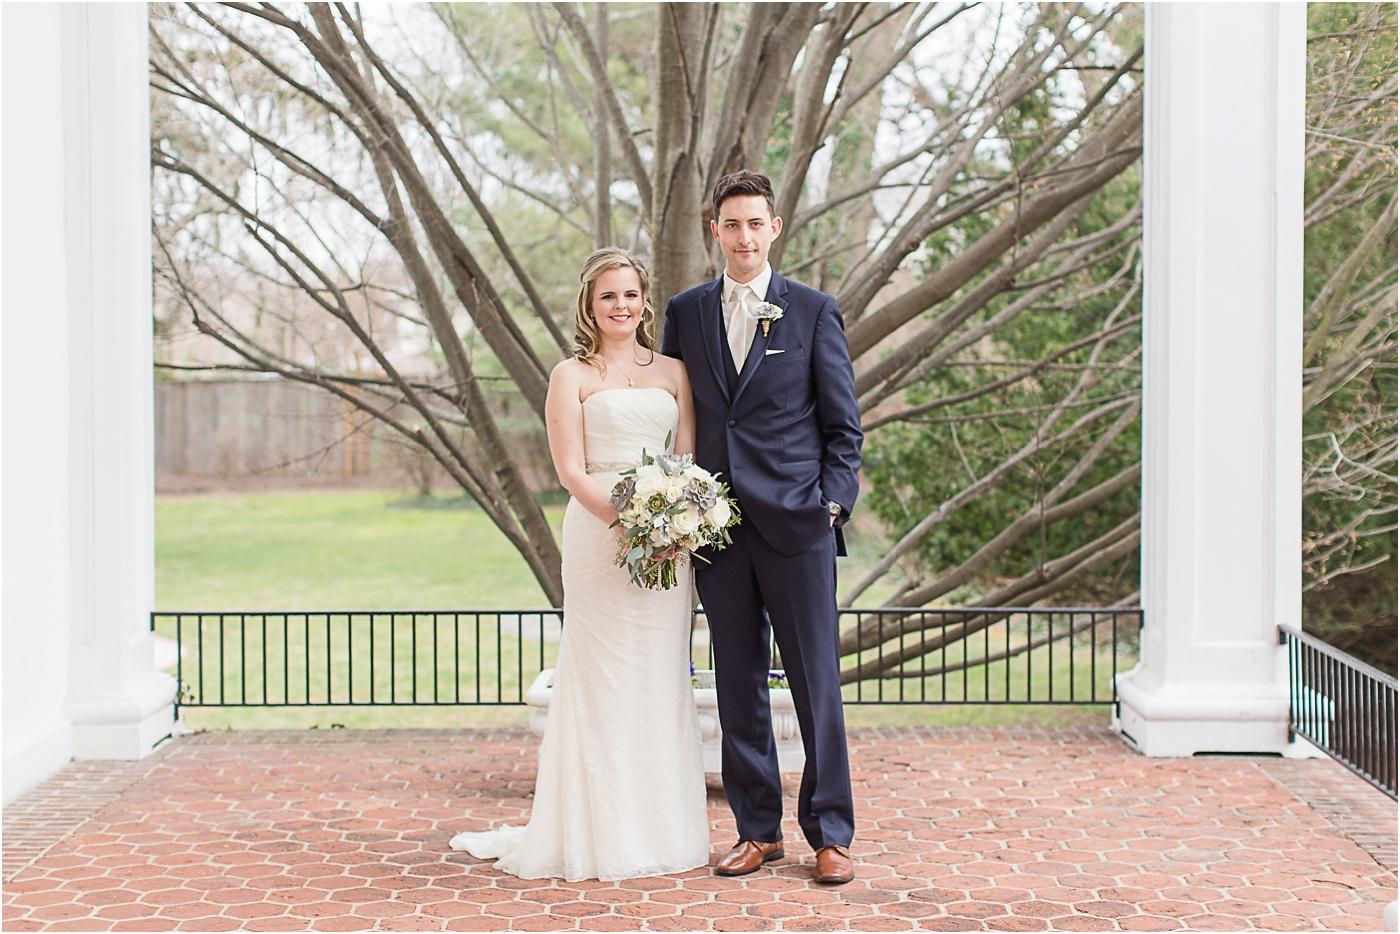 Greyrock-mansion-wedding-48.jpg